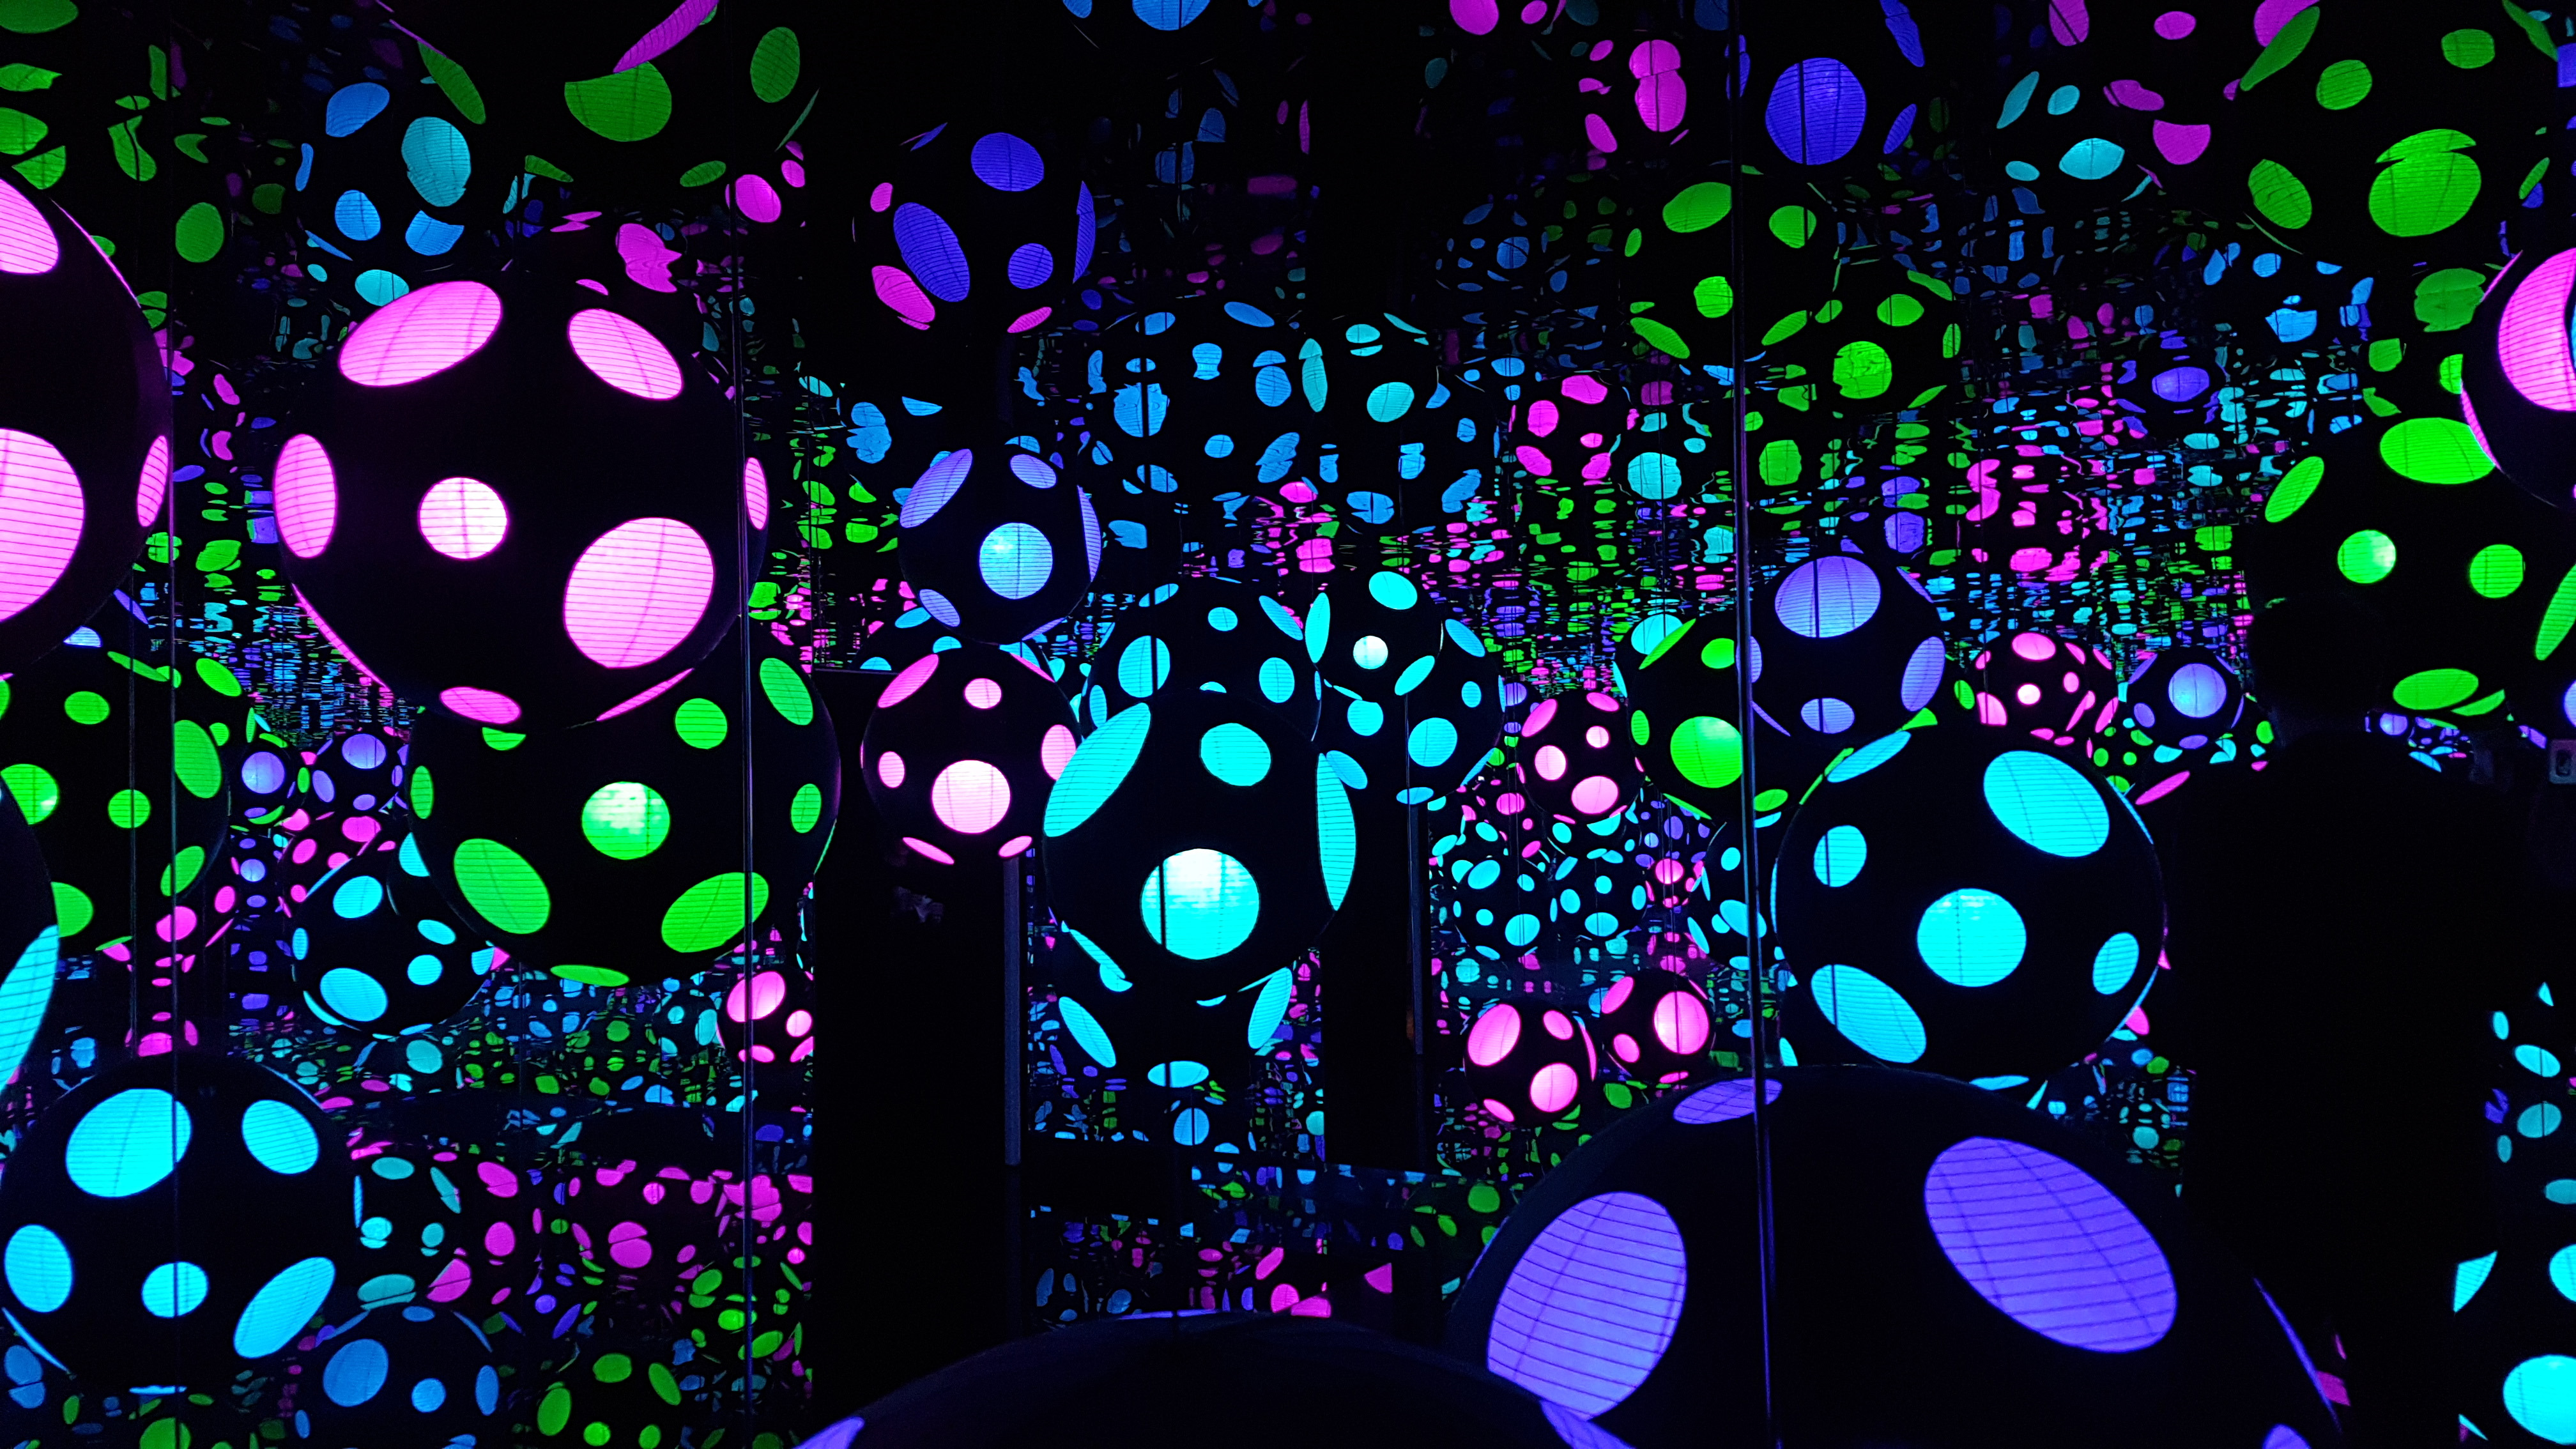 Polka Dot Balls Mirror Room